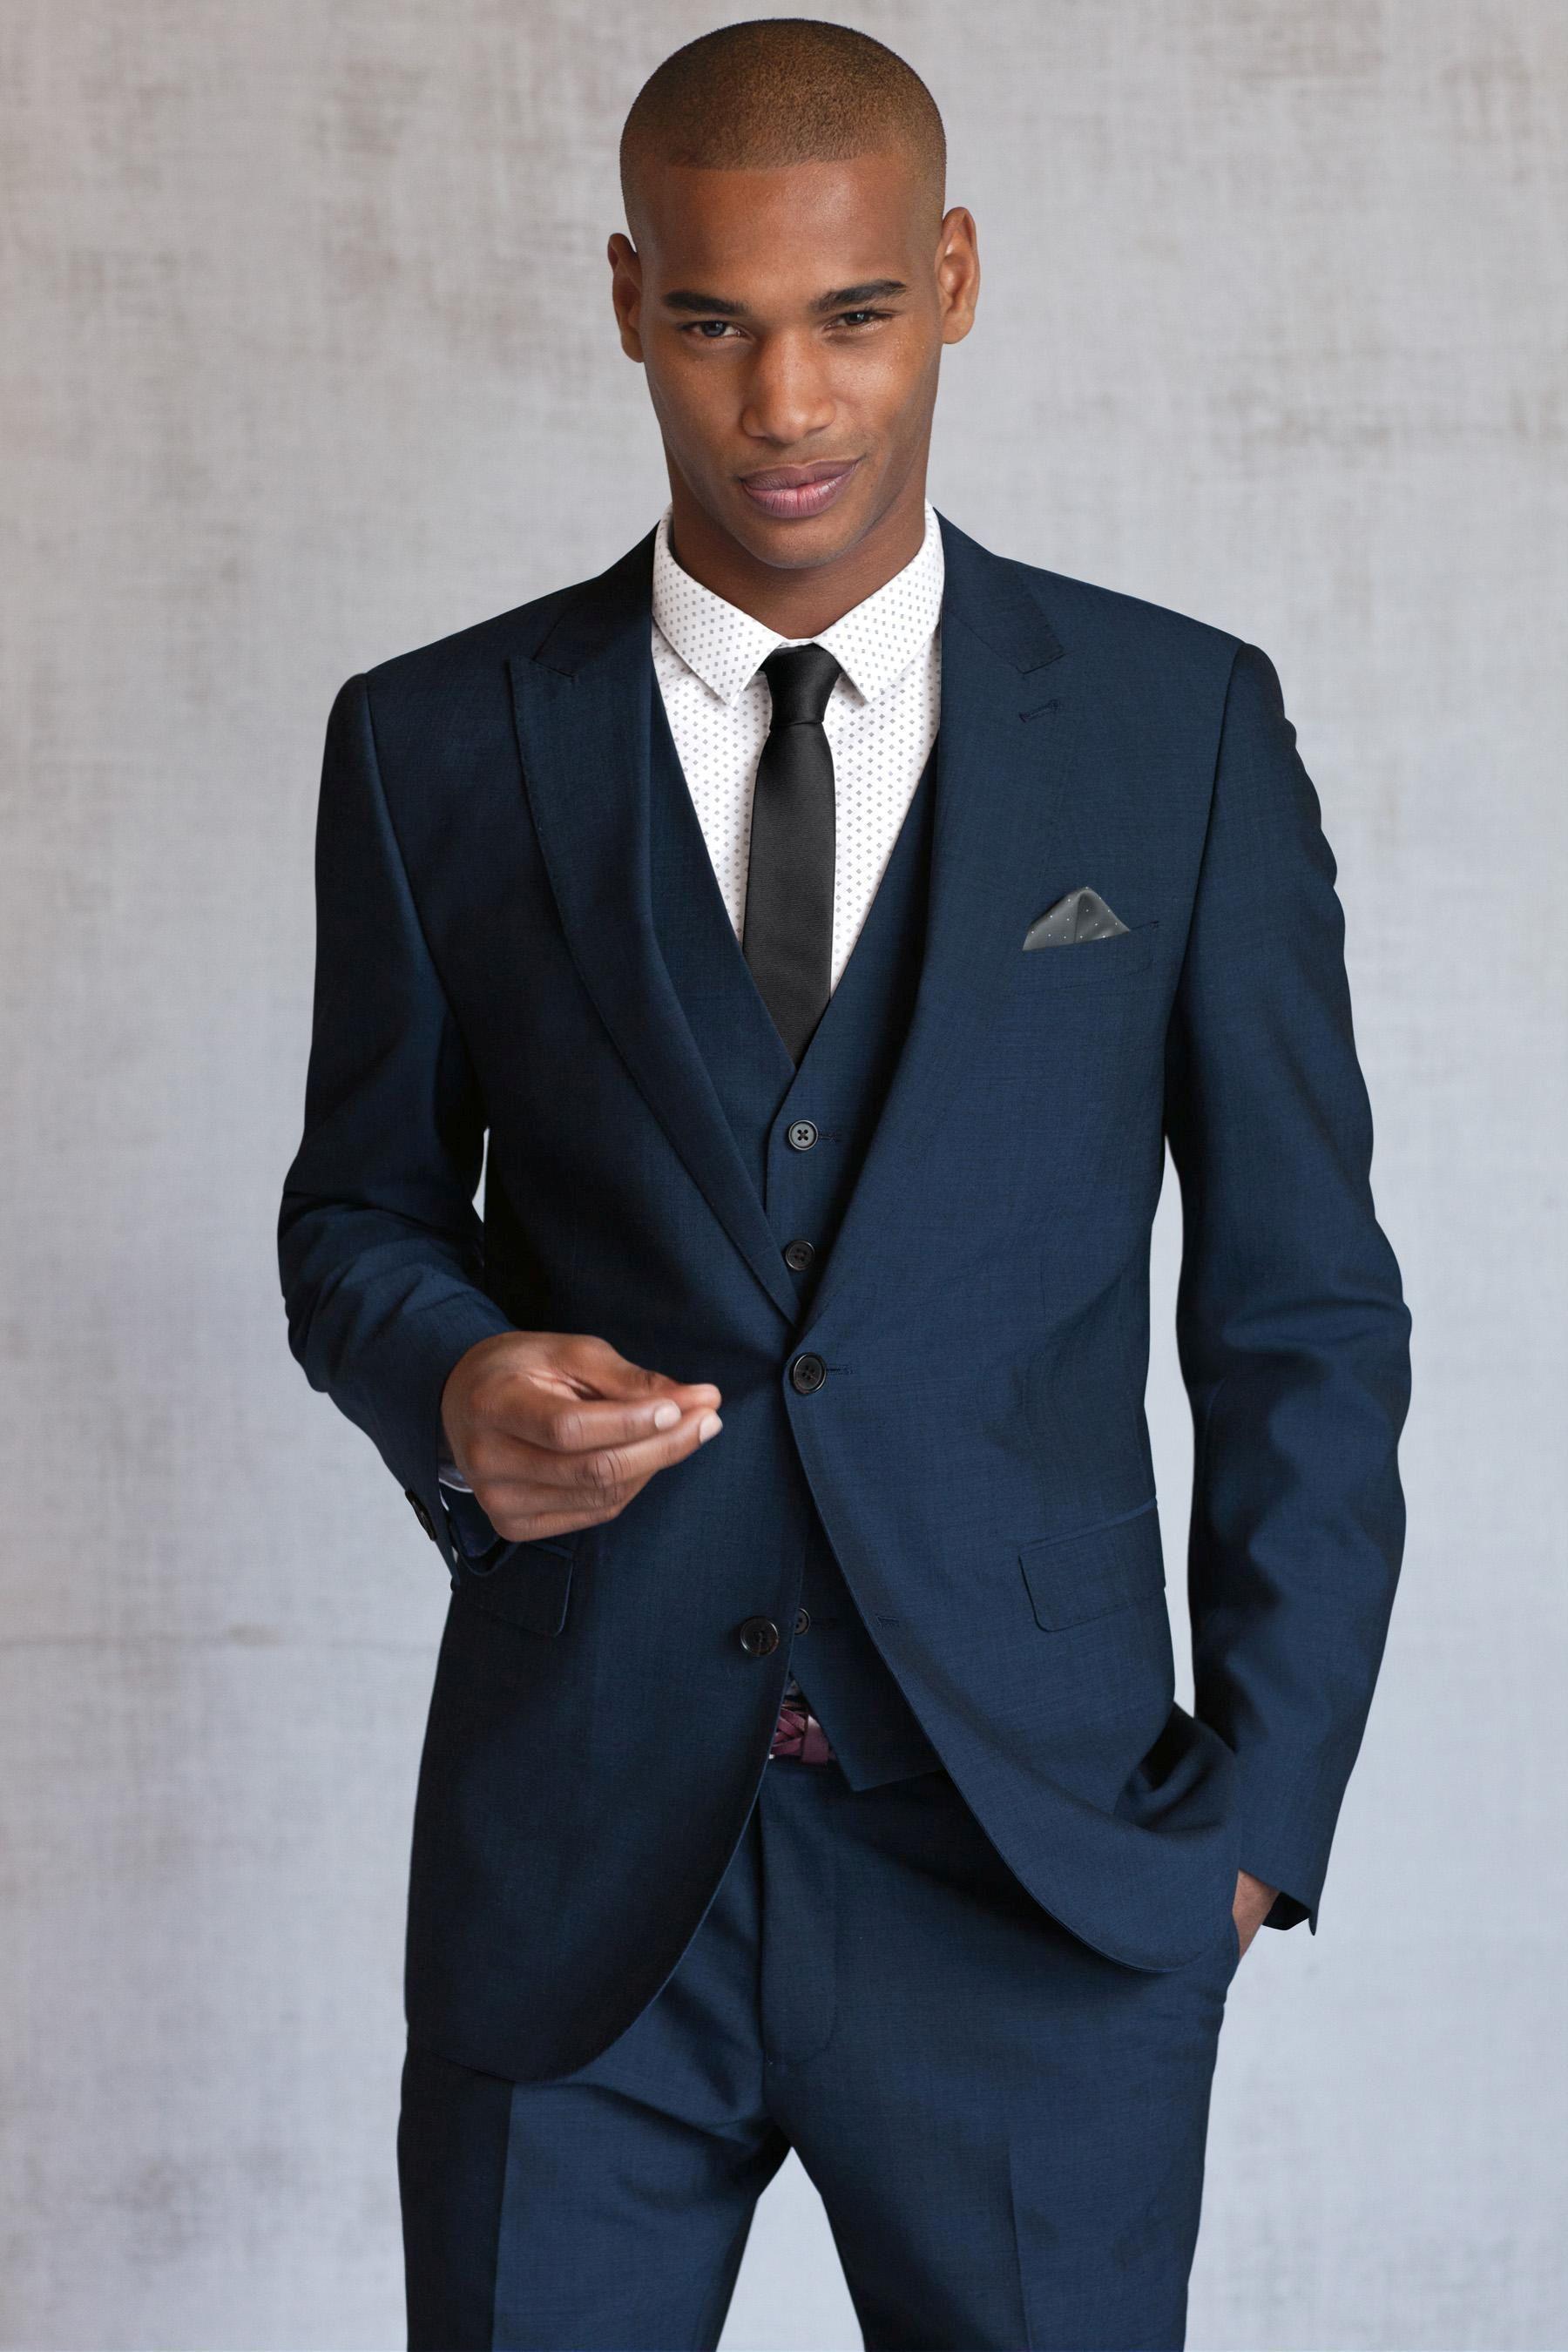 218b12eef798 Blue Wedding Suits For Men Men Suits Slim Fit Men Tuxedos Peaked Lapel  Groomsmen Suits Grooms Wedding Suit Jacket+Pants+Vest+Tie Y9 Groom Tuxedos  Wedding ...